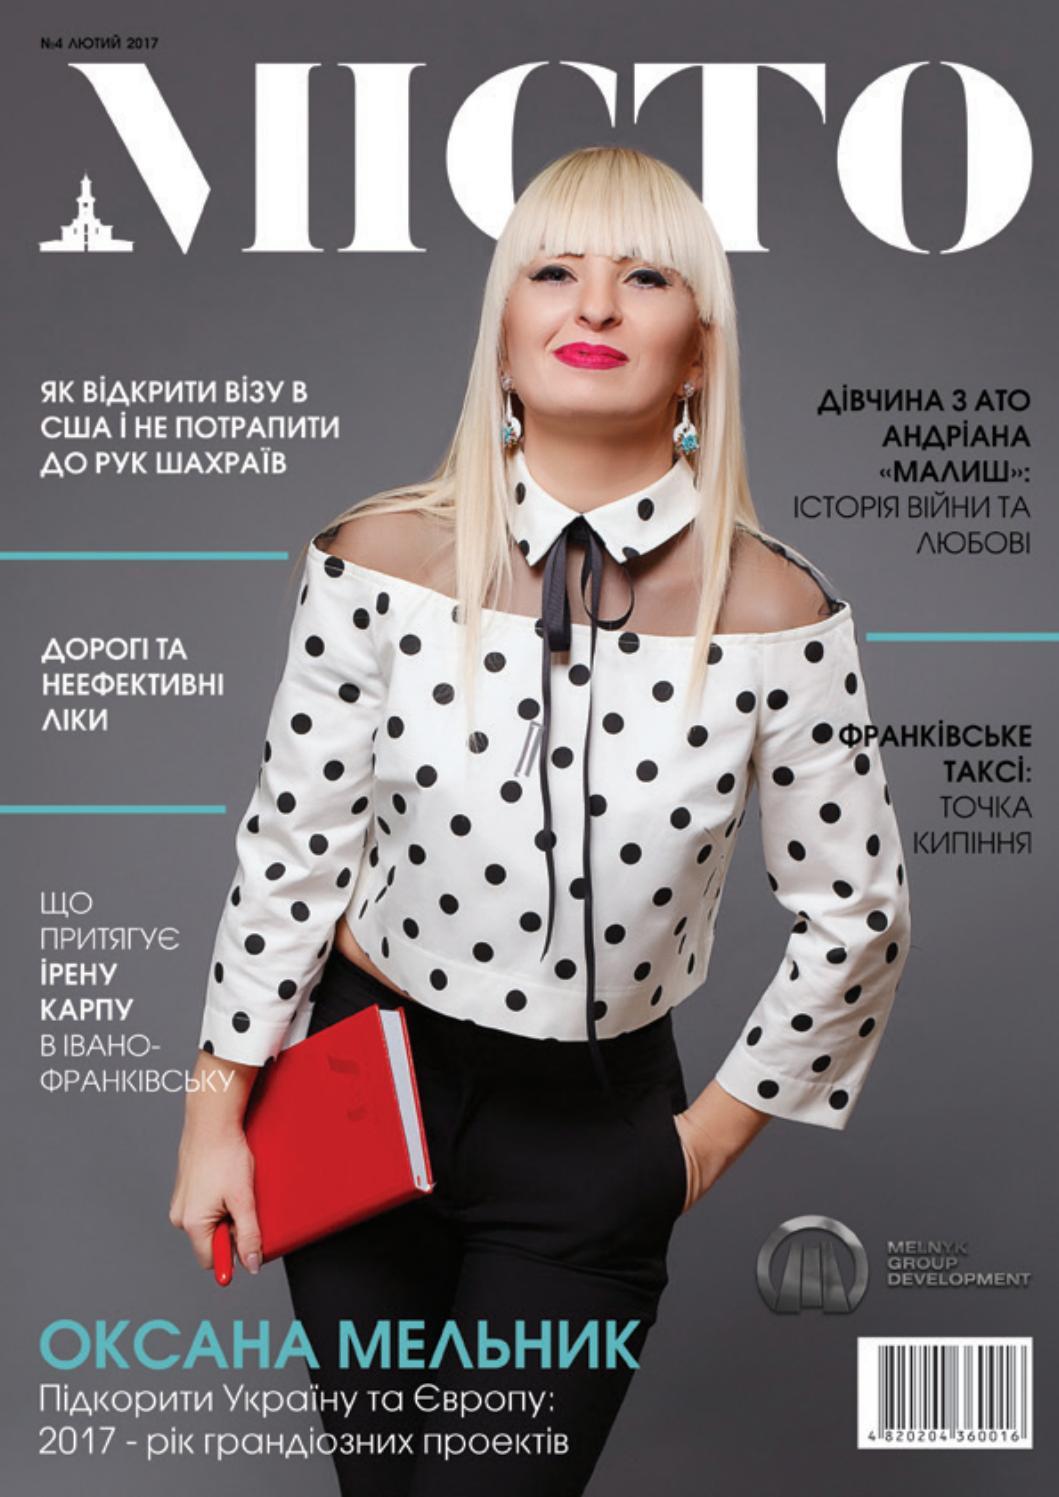 Журнал МІСТО № 4 by МІСТО - issuu 89c2e16274387